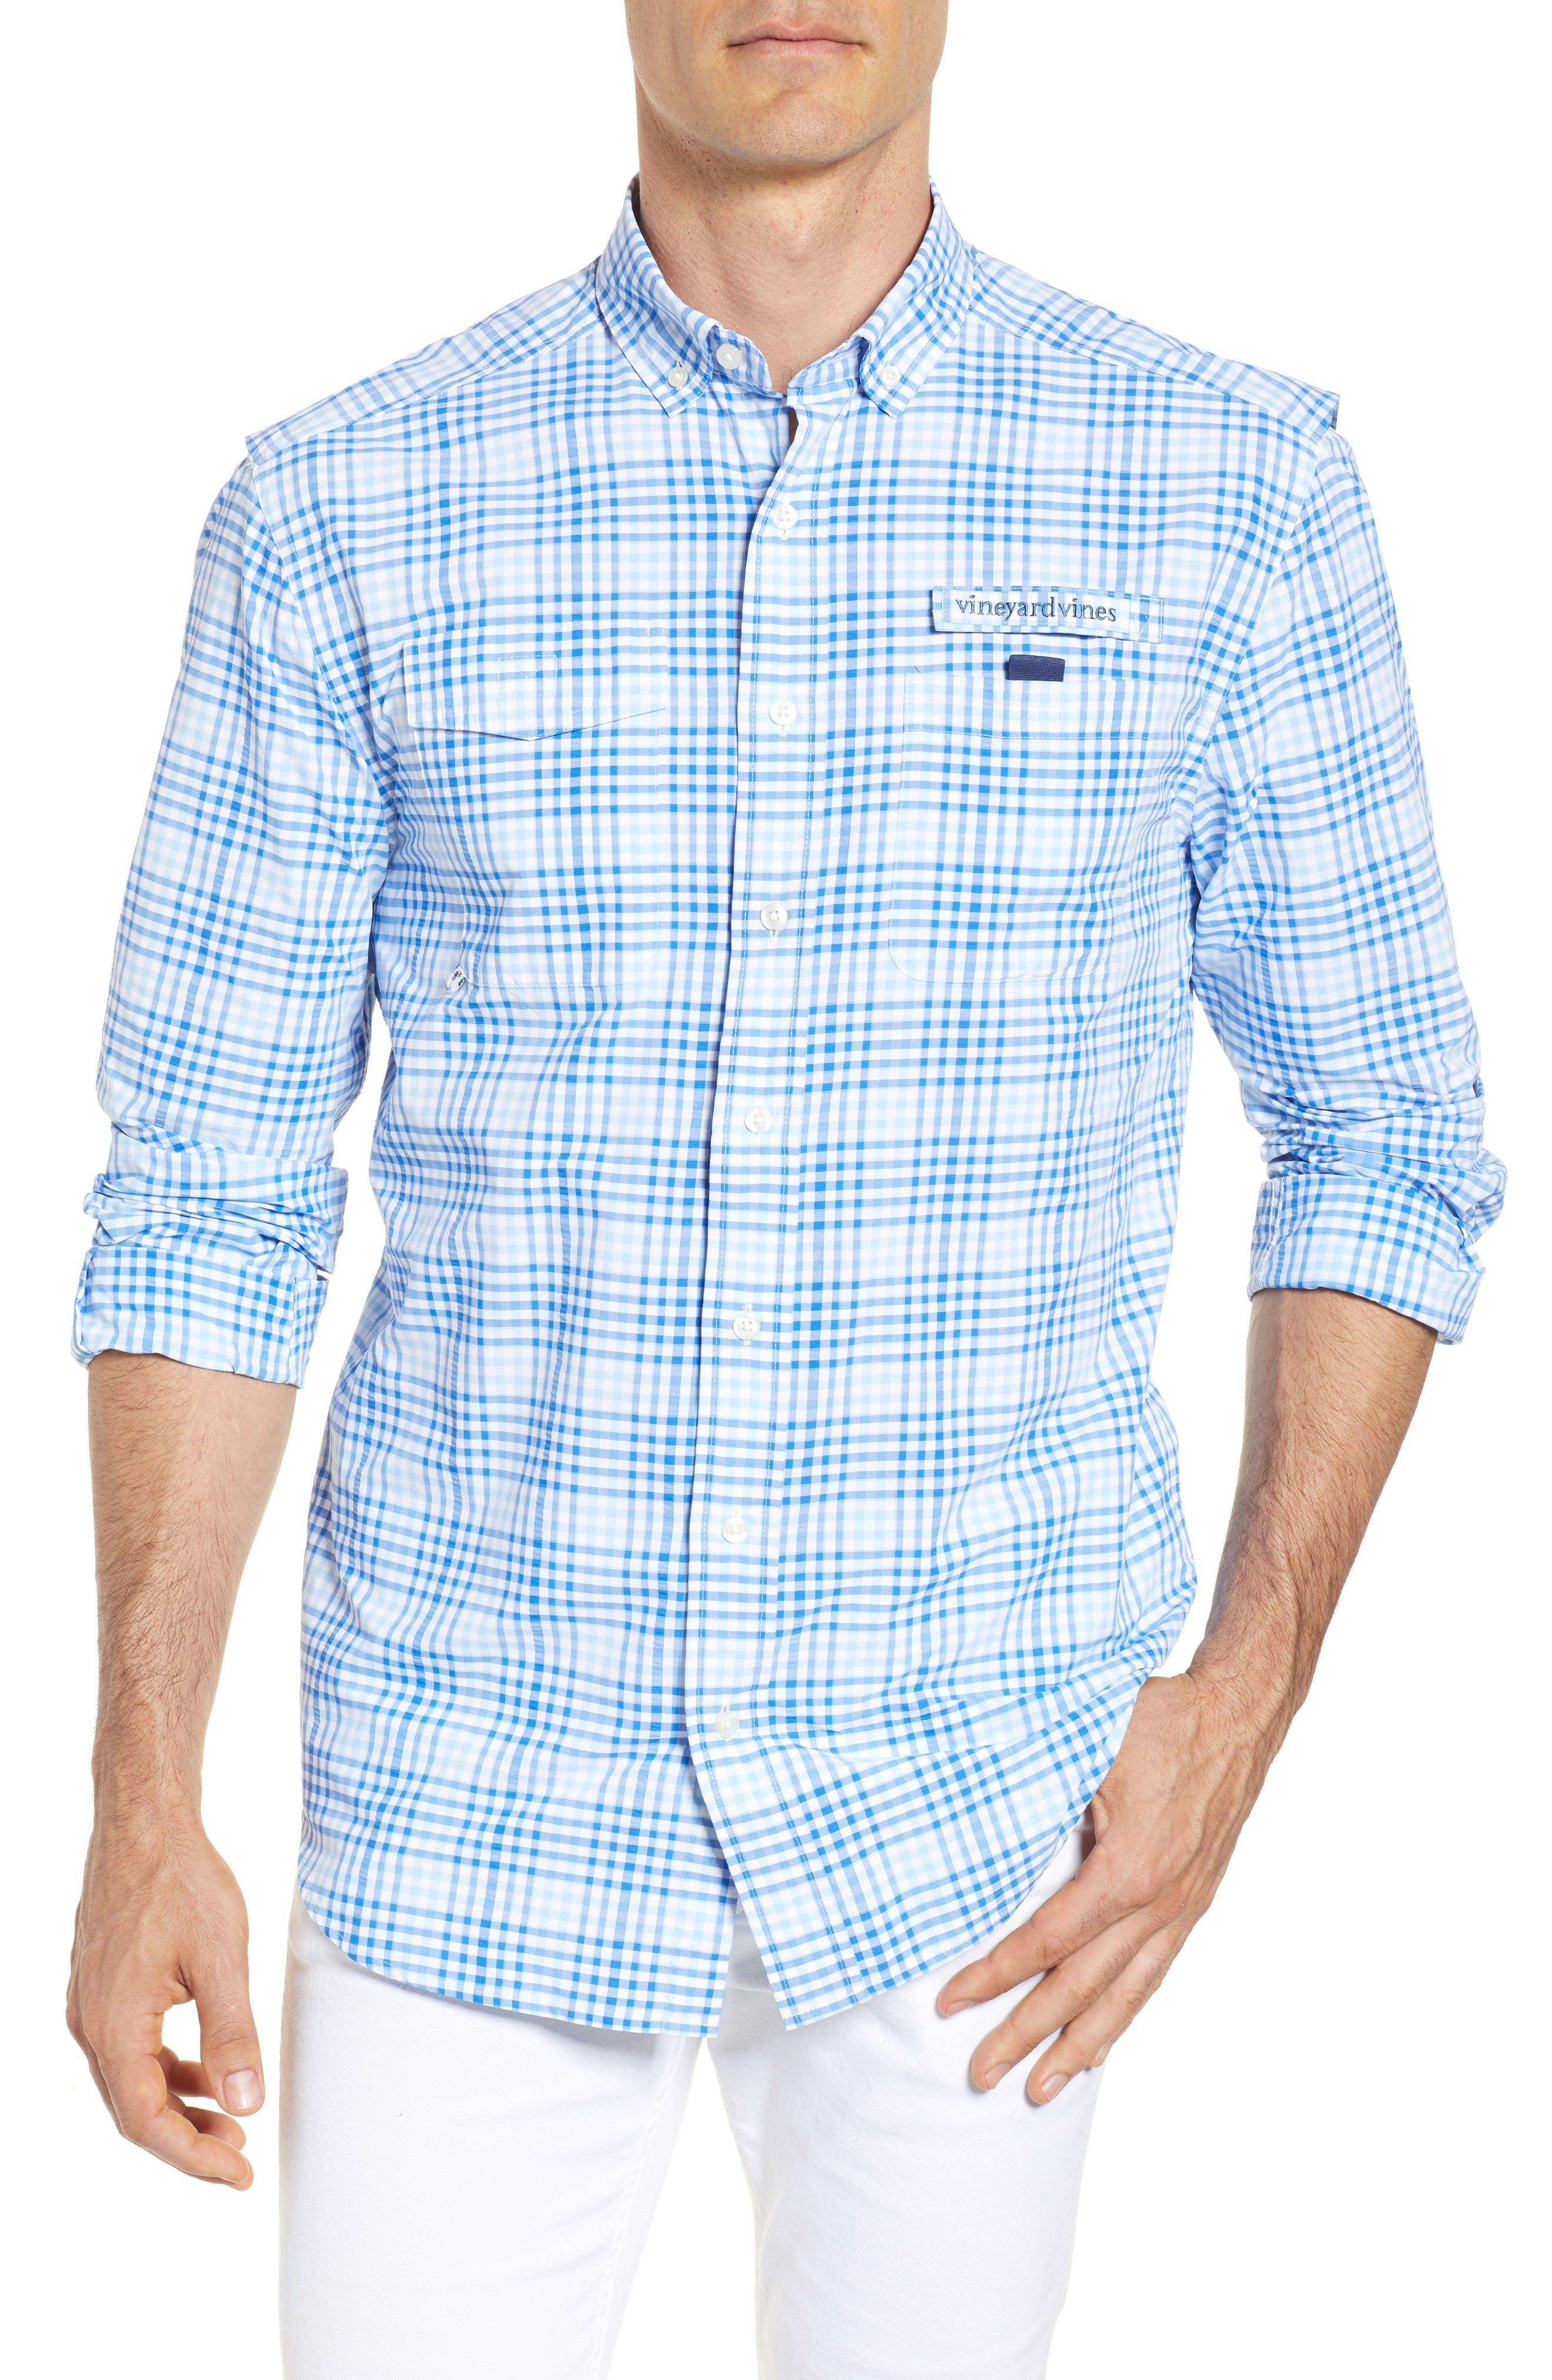 South Shore Harbor Regular Fit Plaid Performance Sport Shirt,                             Main thumbnail 1, color,                             JAKE BLUE